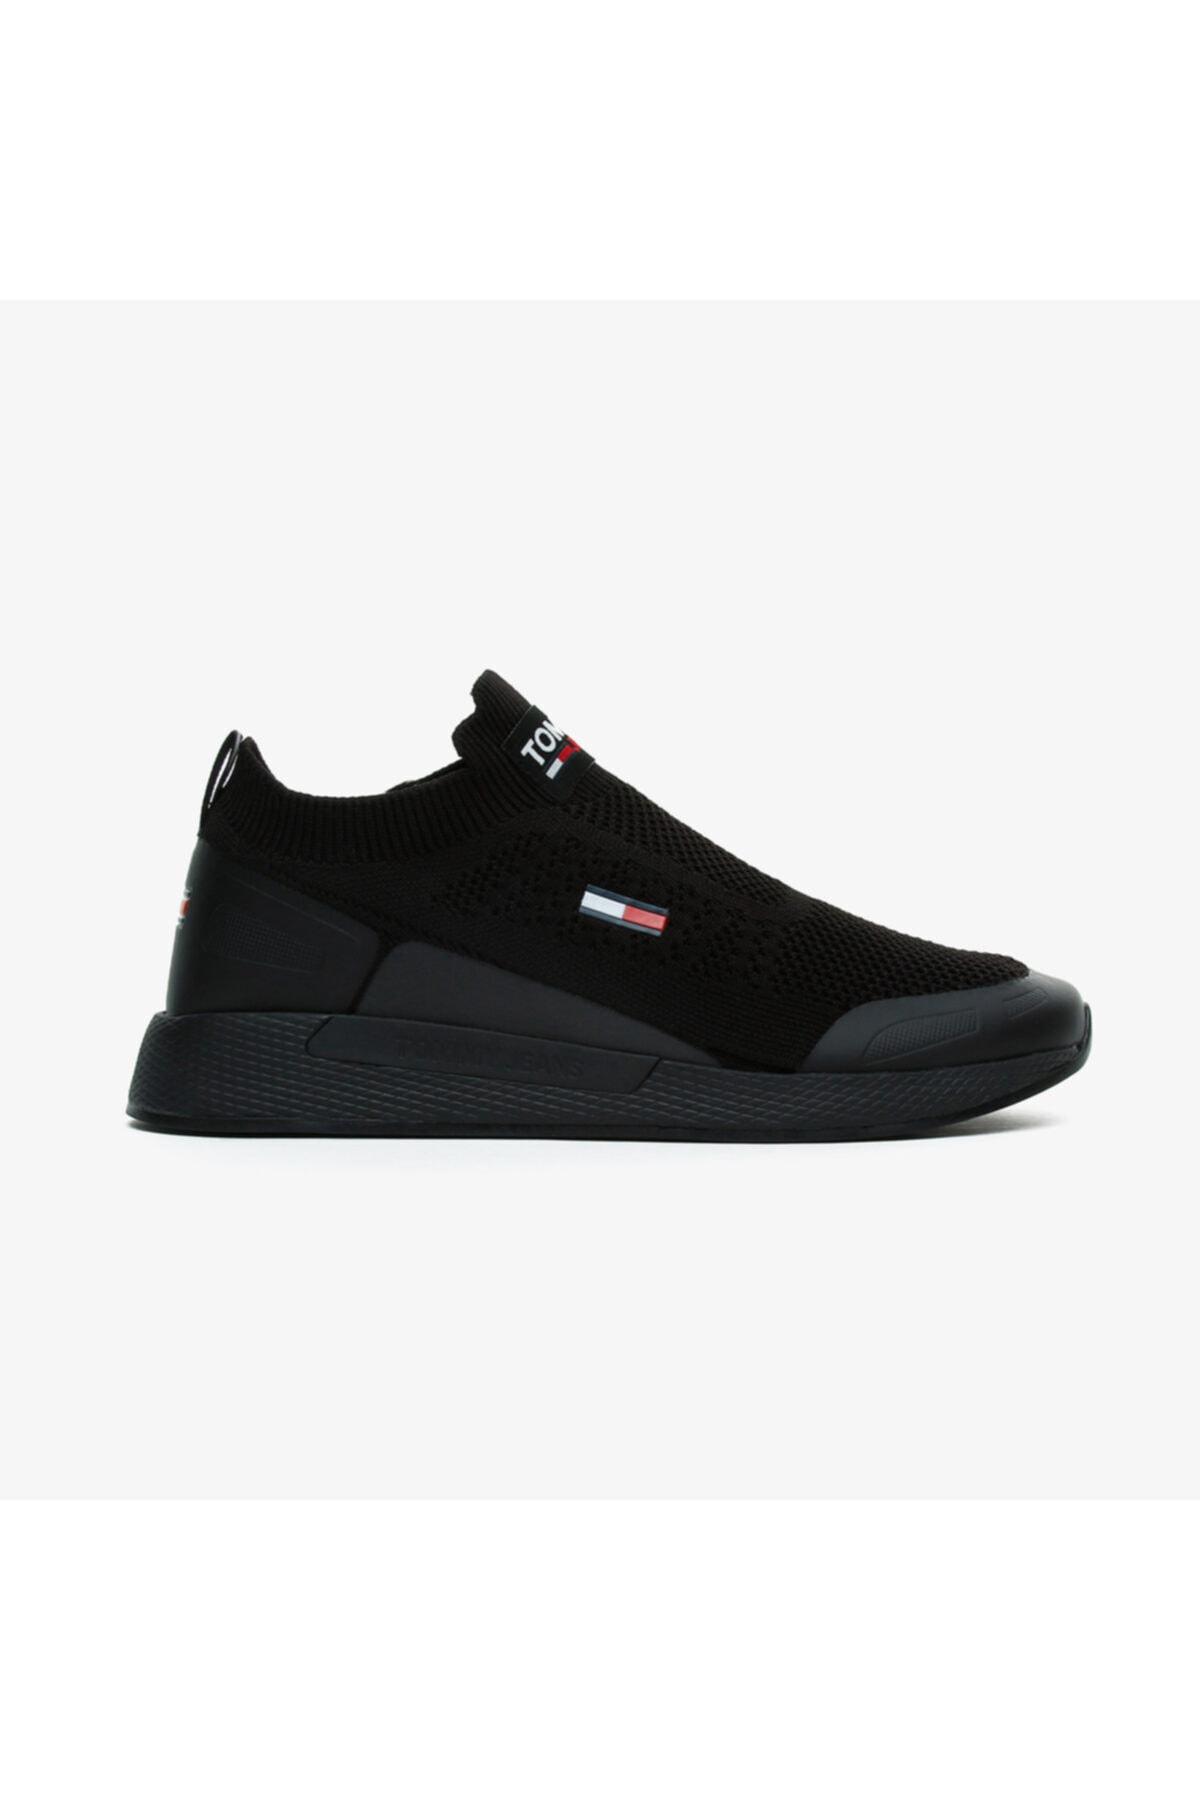 Tommy Hilfiger Erkek Siyah Bağcıksız Spor Ayakkabı 1